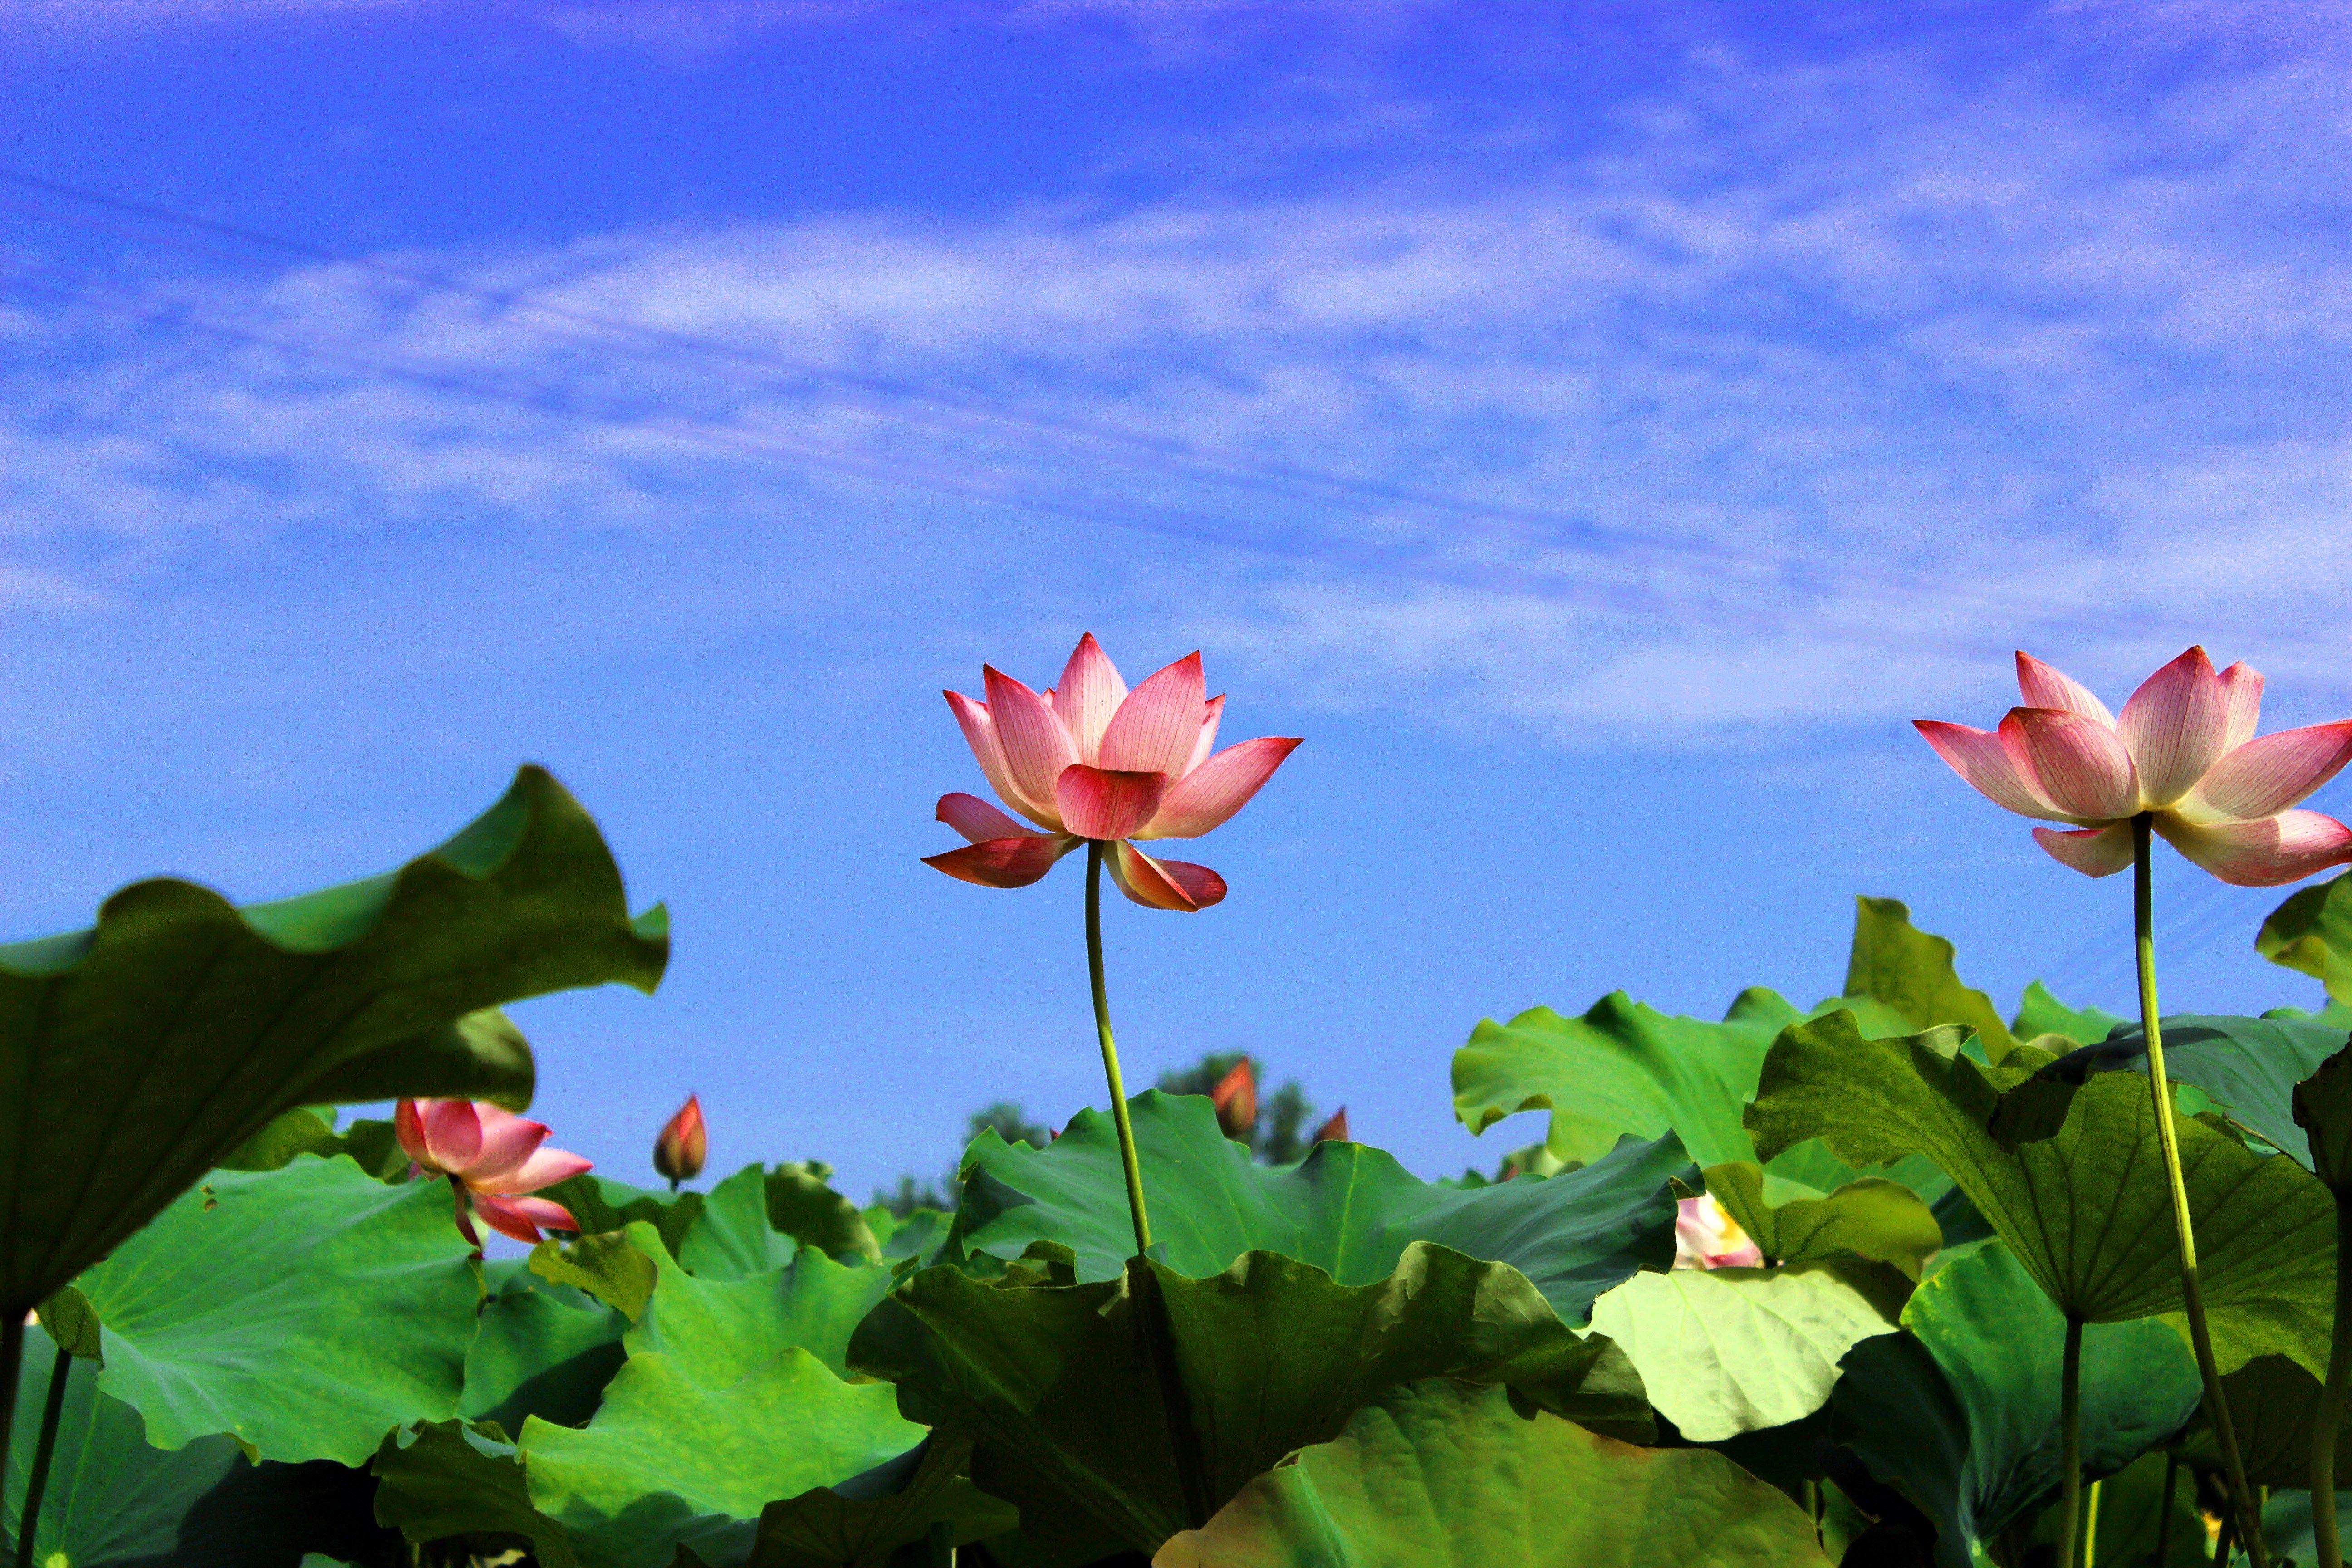 Hd lotus flower wallpapers ololoshka pinterest lotus flower hd lotus flower wallpapers mightylinksfo